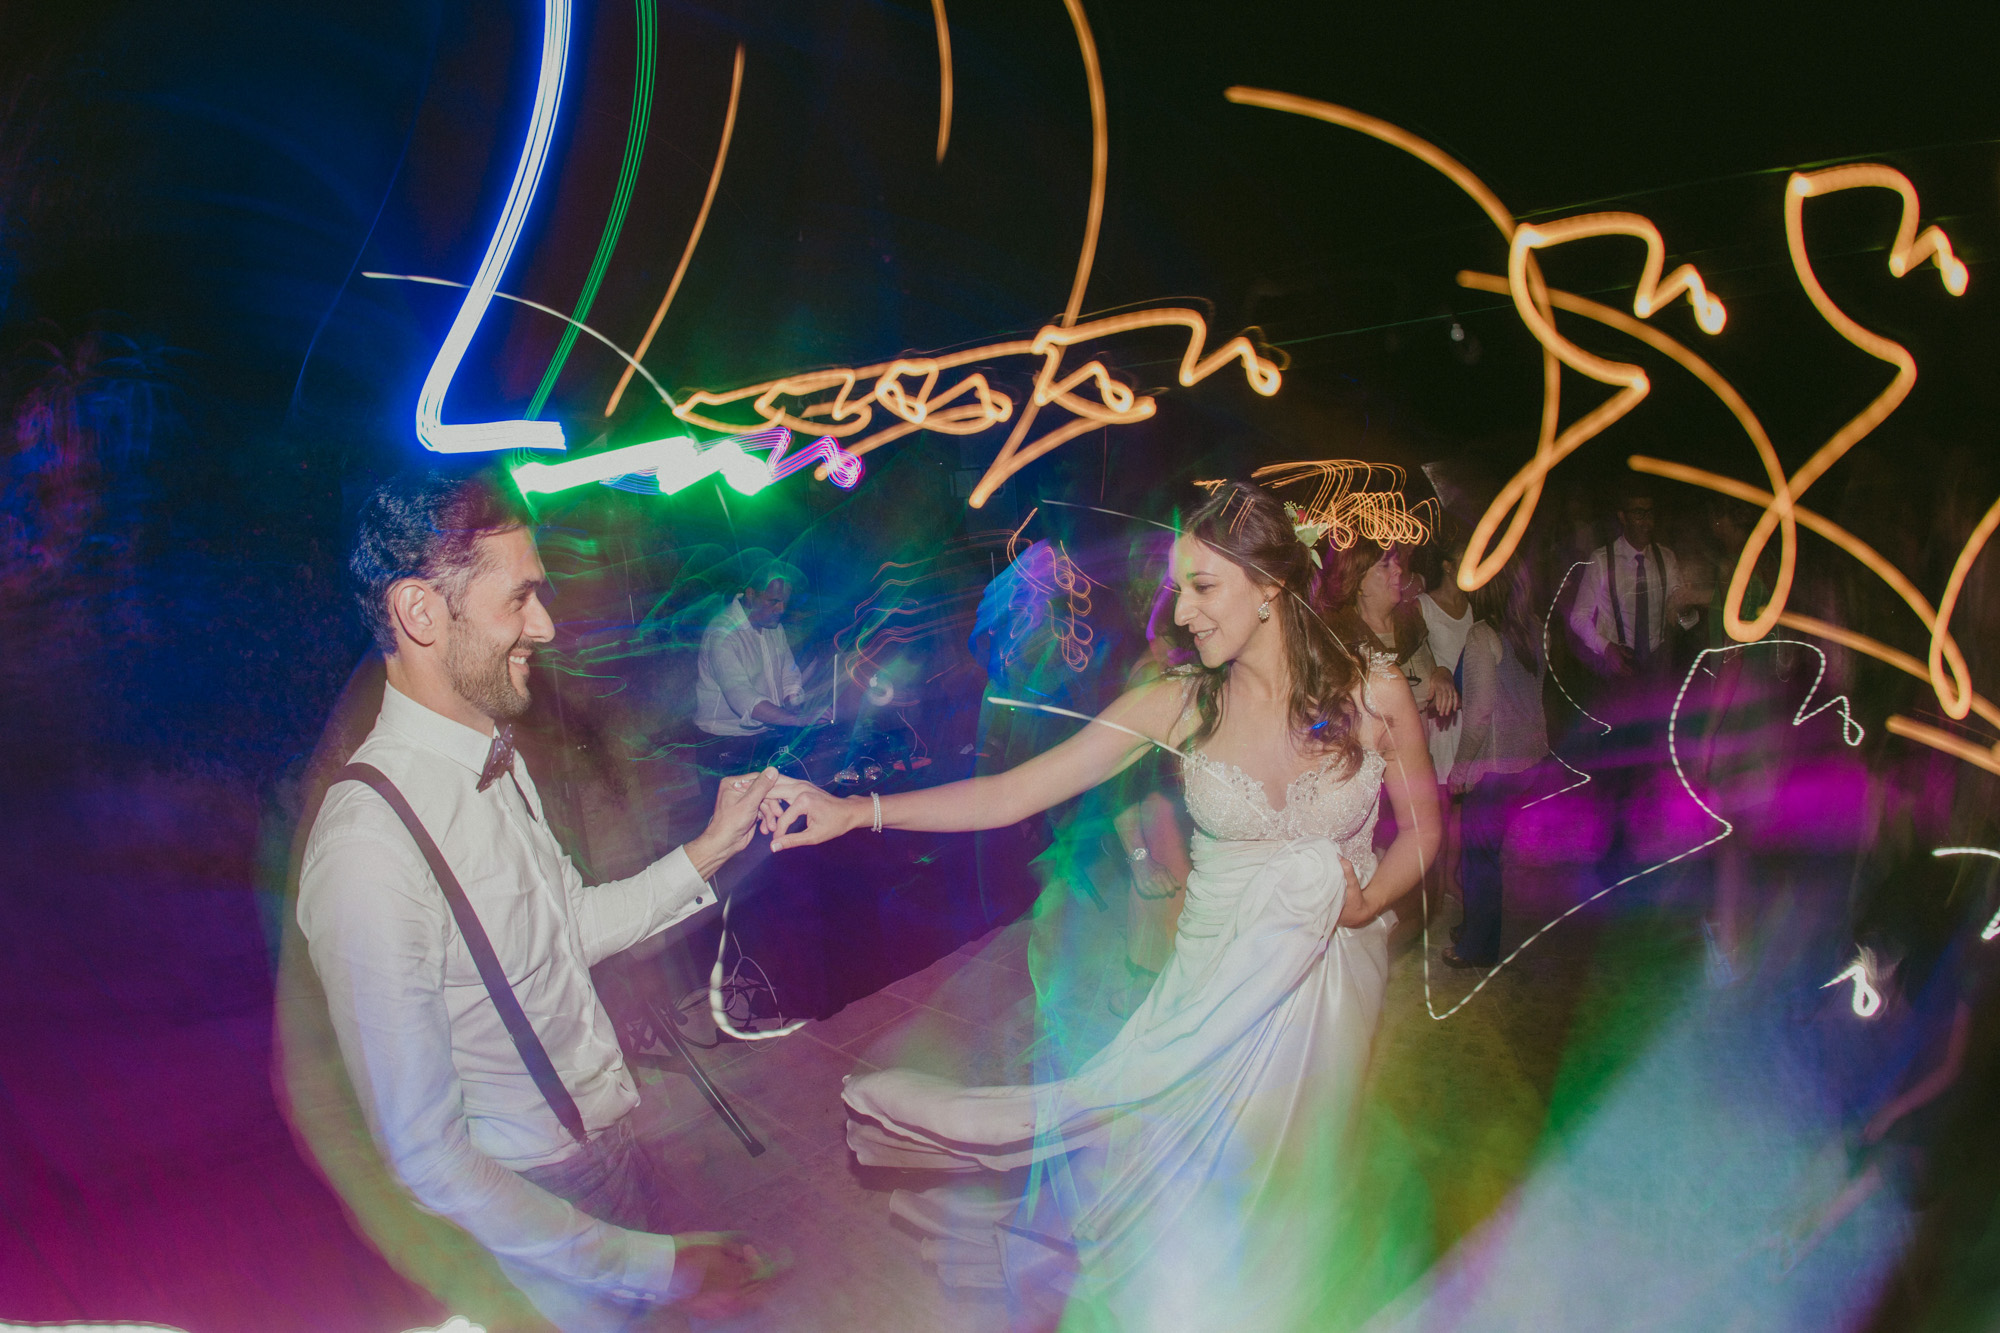 006-carina-e-samuel-wedding-casamento-quinta-dos-rouxinois-rustico-my-fancy-wedding-mafra-malveira-lisboa-sintra-cascais-filipe-santiago-fotografia-fotografo-lifestyle-destination-portugal